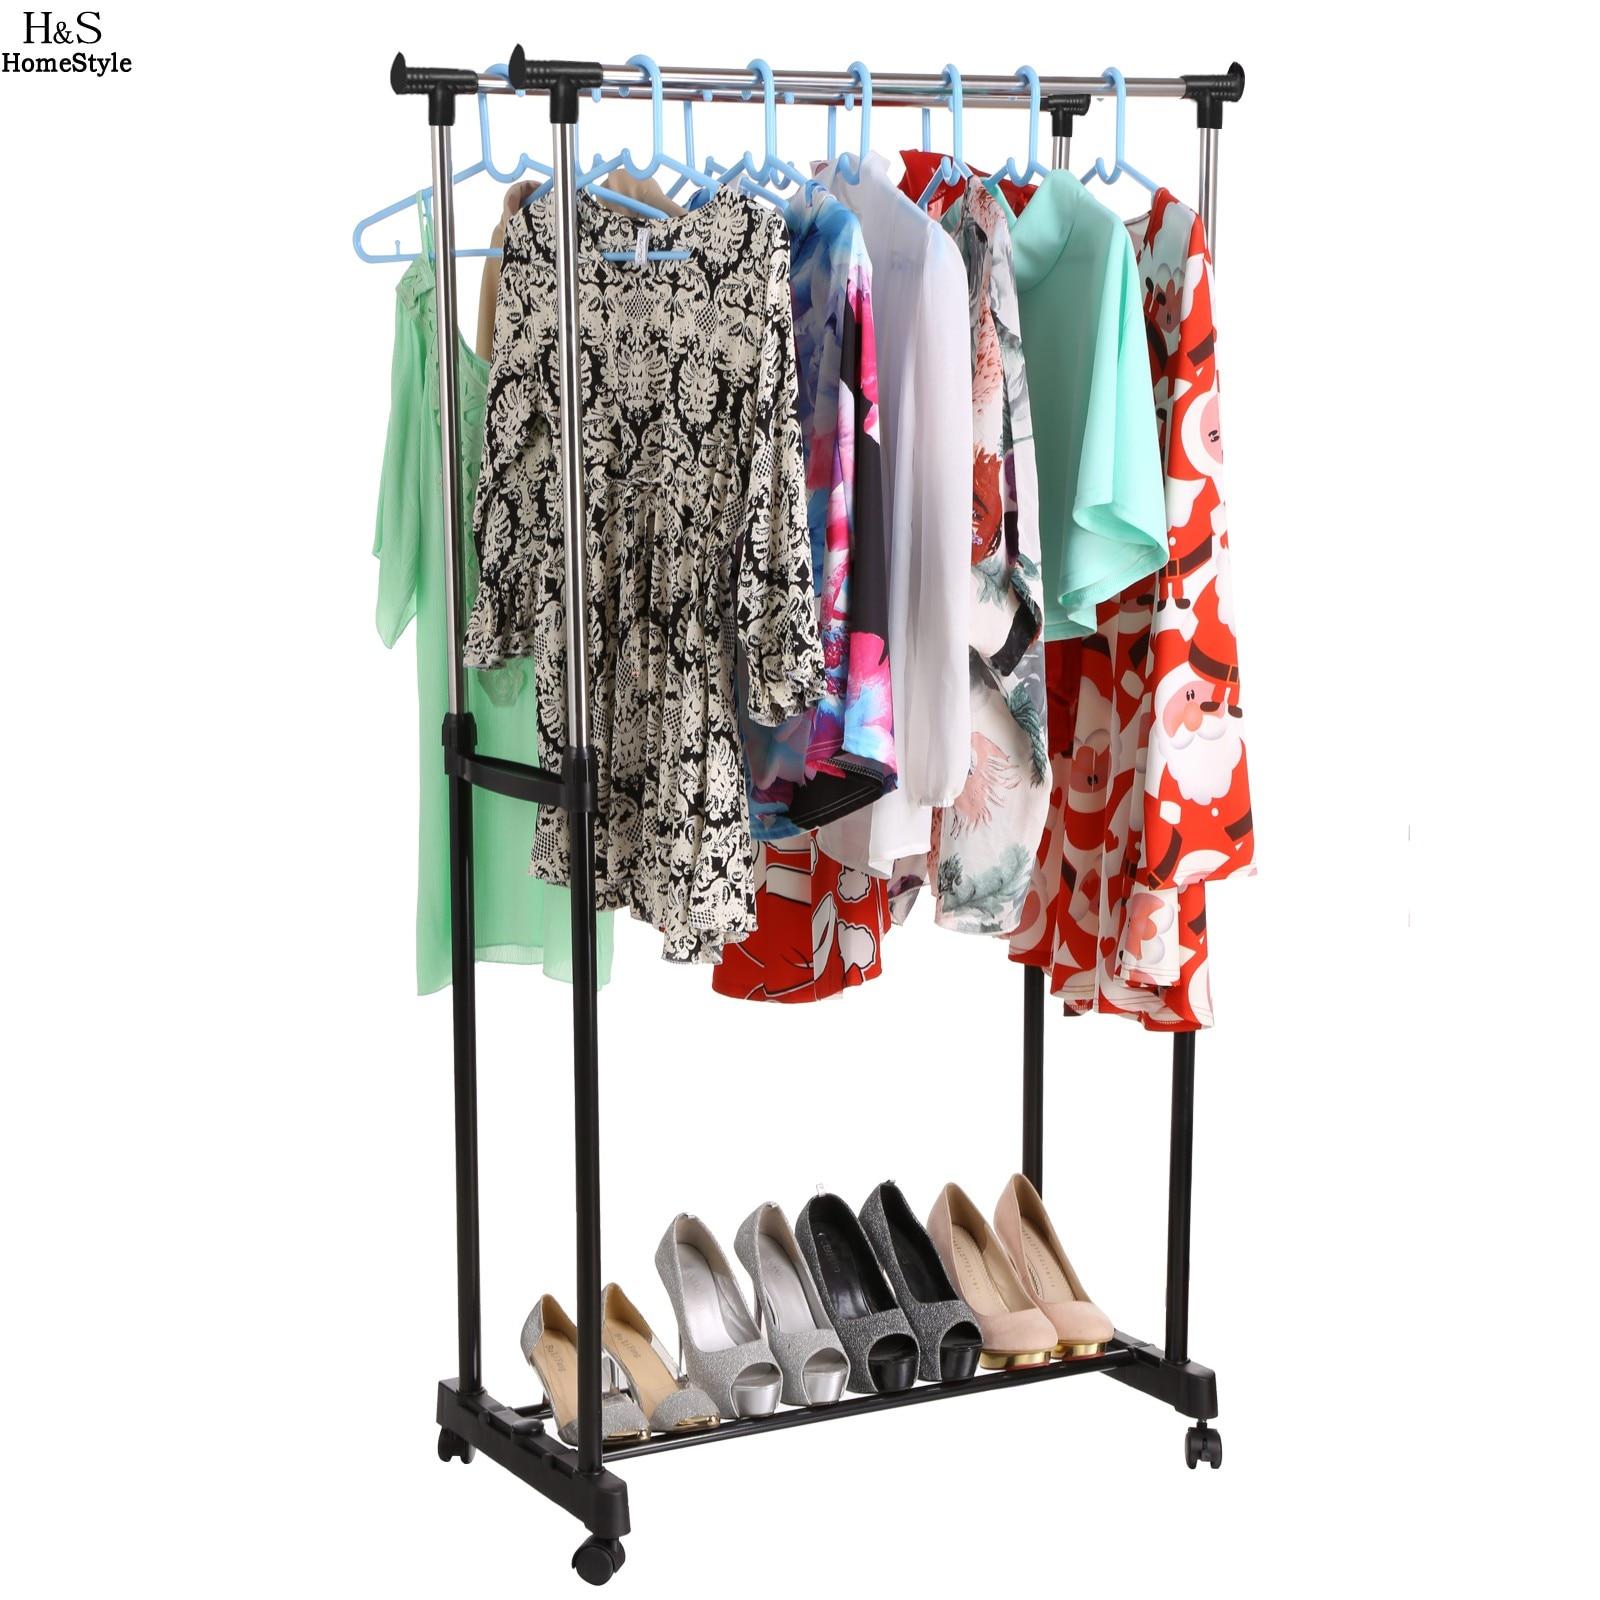 hanger clothes rack